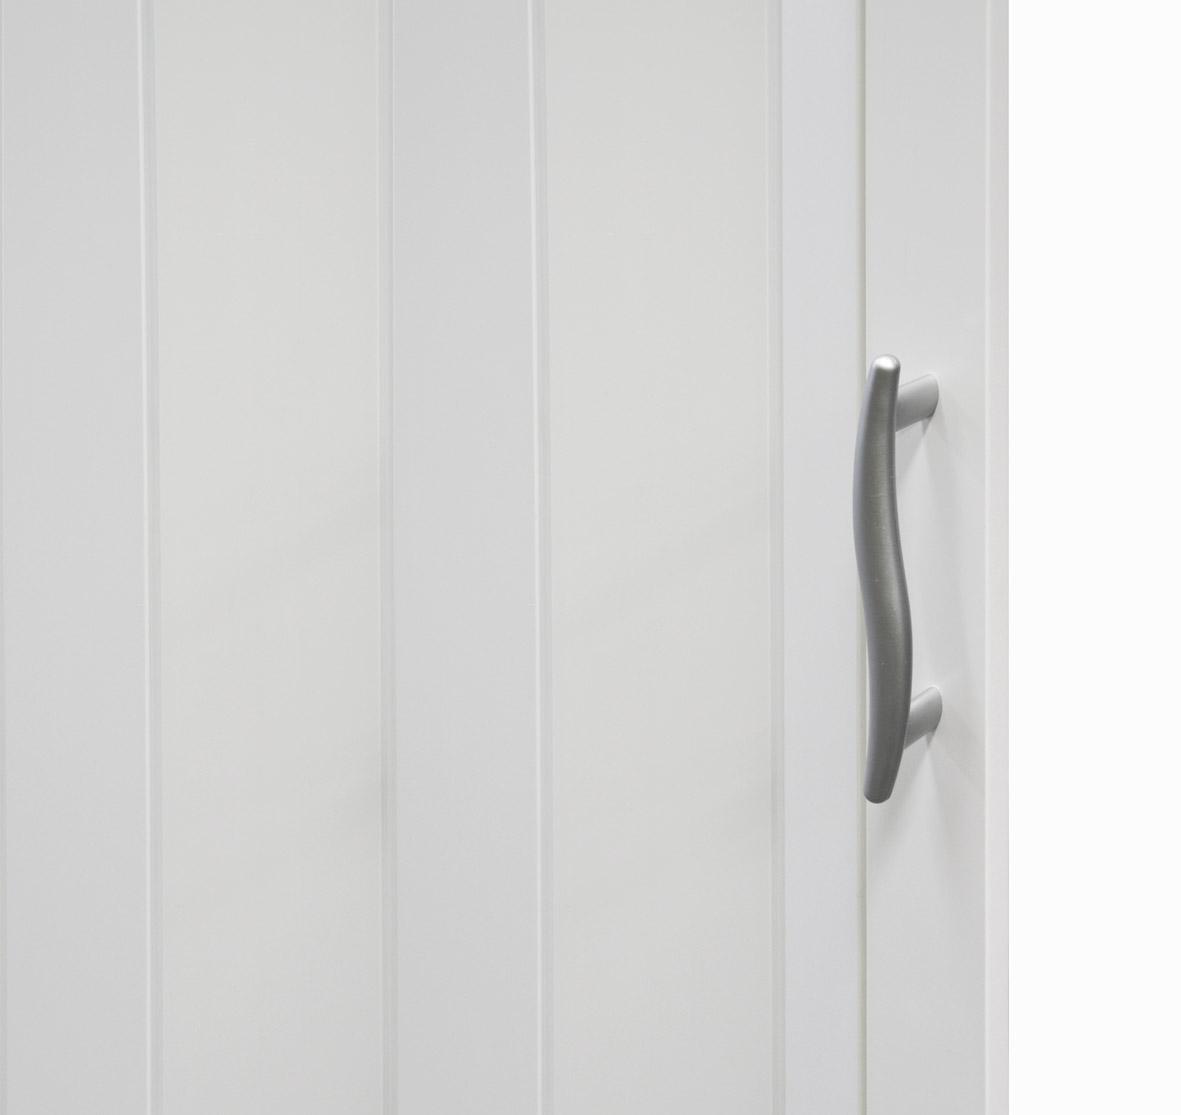 Monaco Pvc Concertina Door Pillar Products